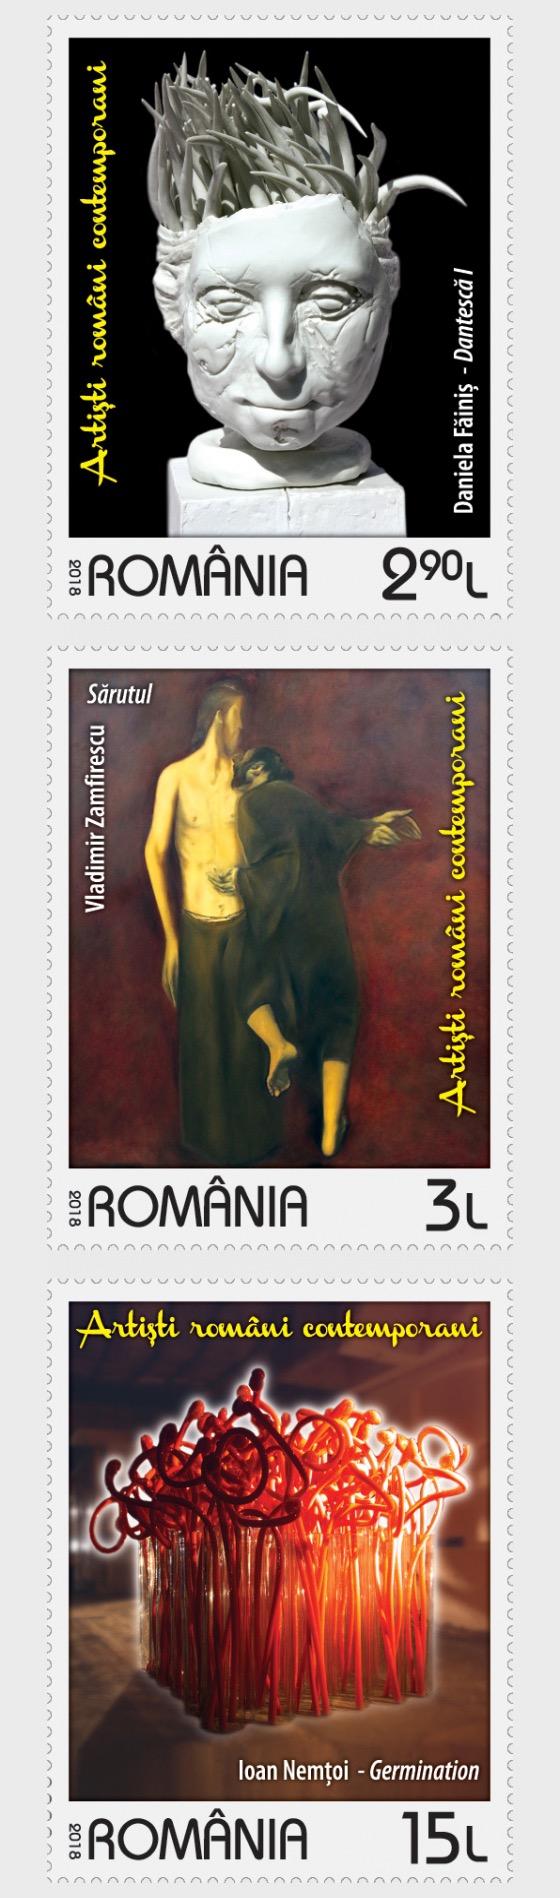 Contemporary Romanian Artists - Set